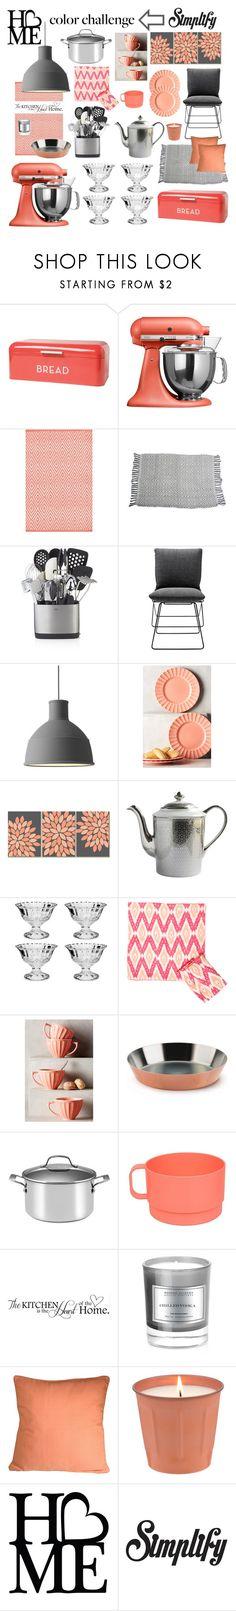 """(37)"" by cristina-daniela-munteanu ❤ liked on Polyvore featuring interior, interiors, interior design, home, home decor, interior decorating, KitchenAid, Dash & Albert, NOVICA and Crate and Barrel"